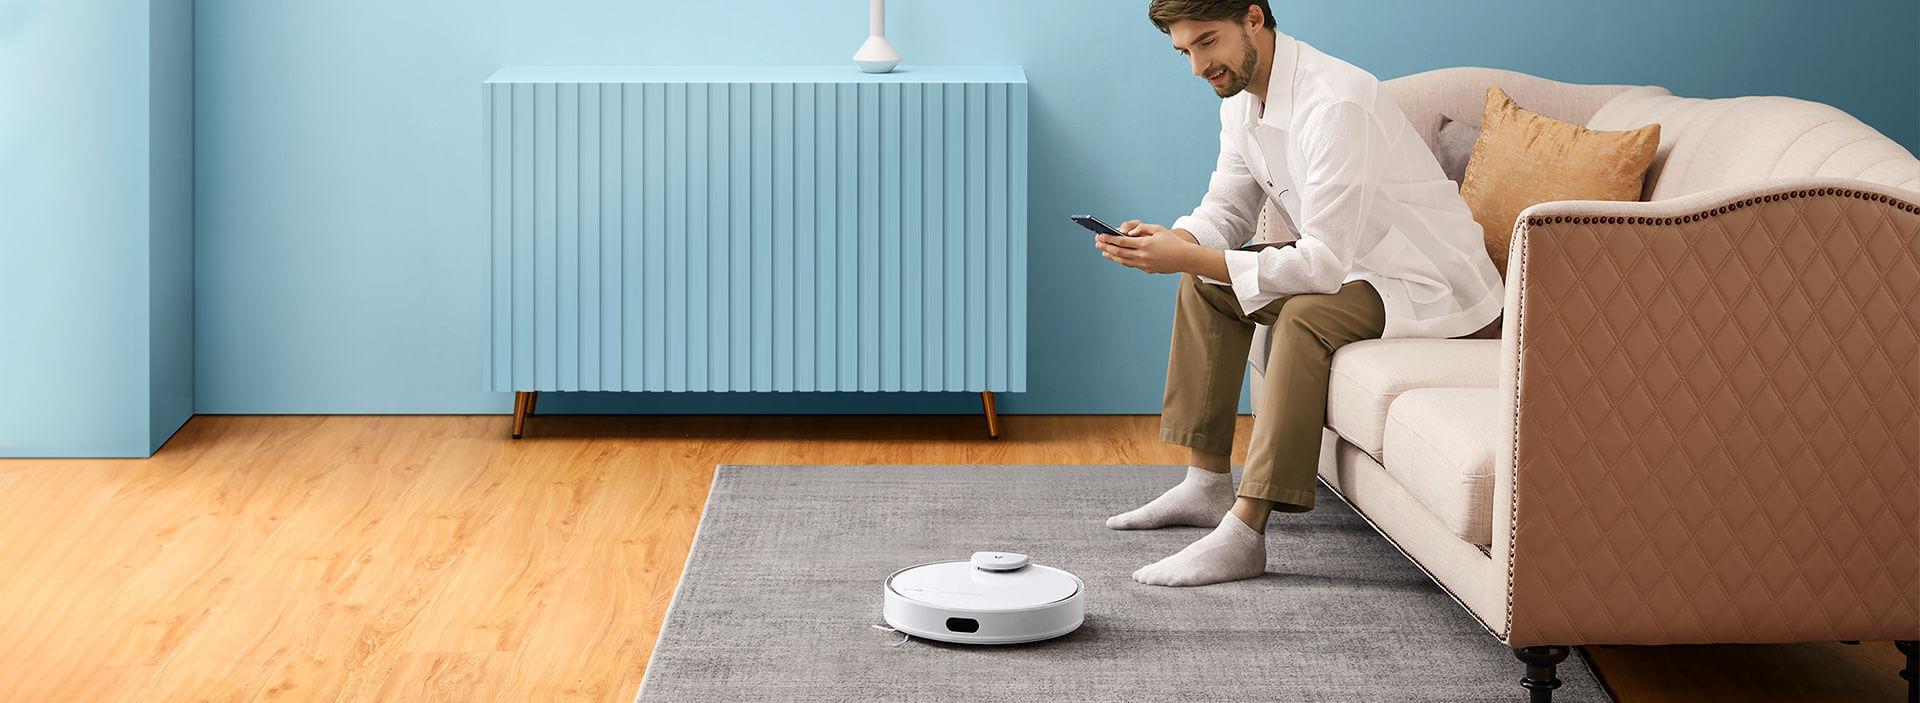 xiaomi,air,purifier,,air,cleaner,,smart,home,appliances,,smart,appliance